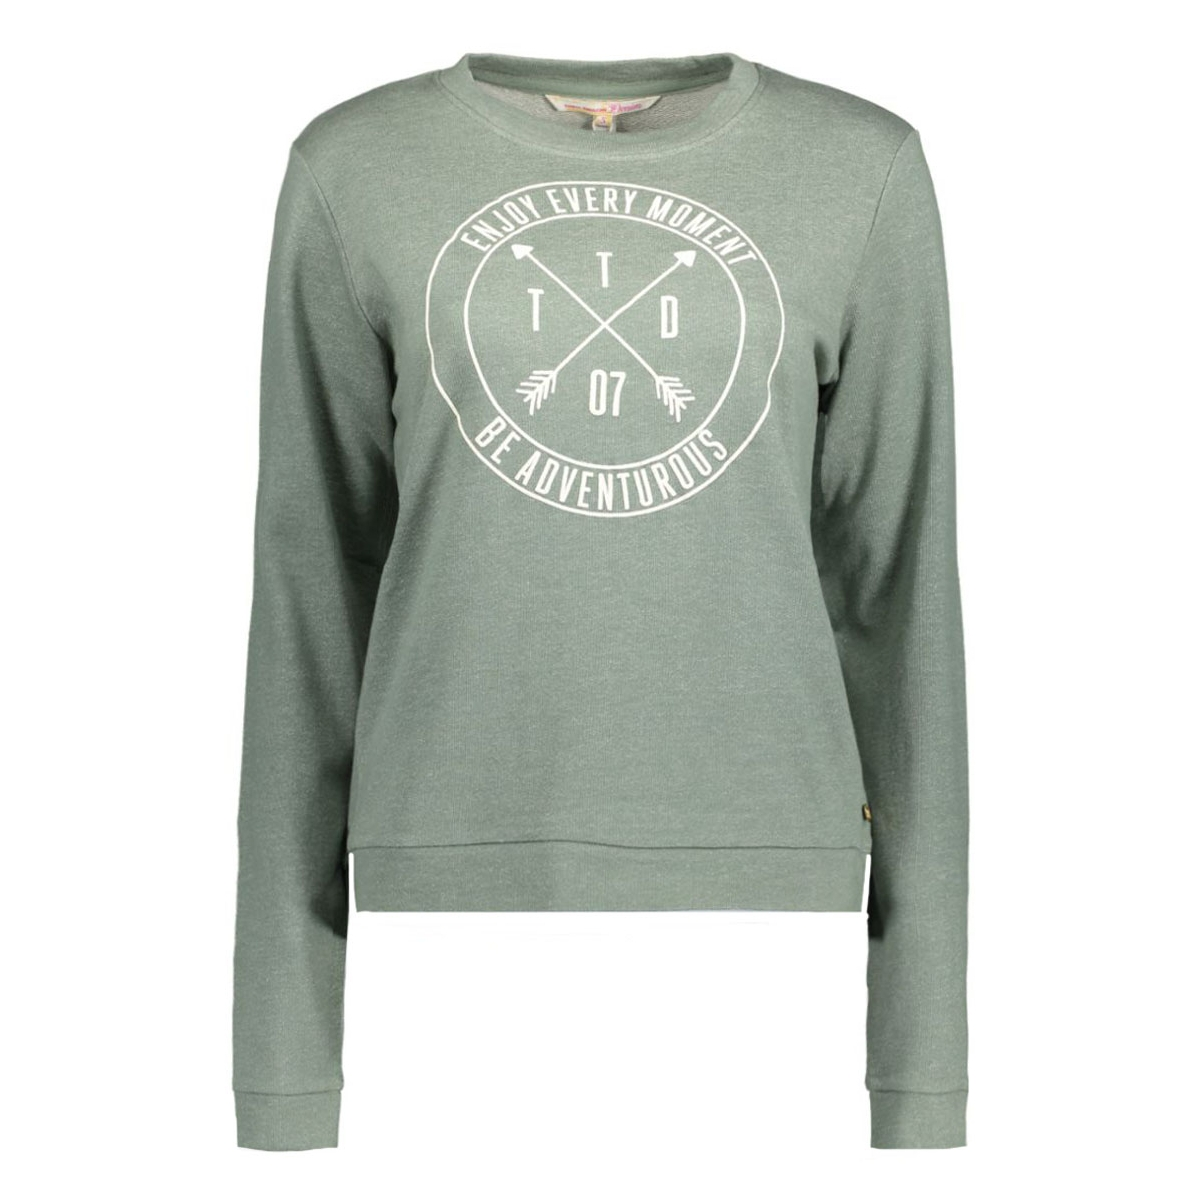 2530637.00.71 tom tailor sweater 7718